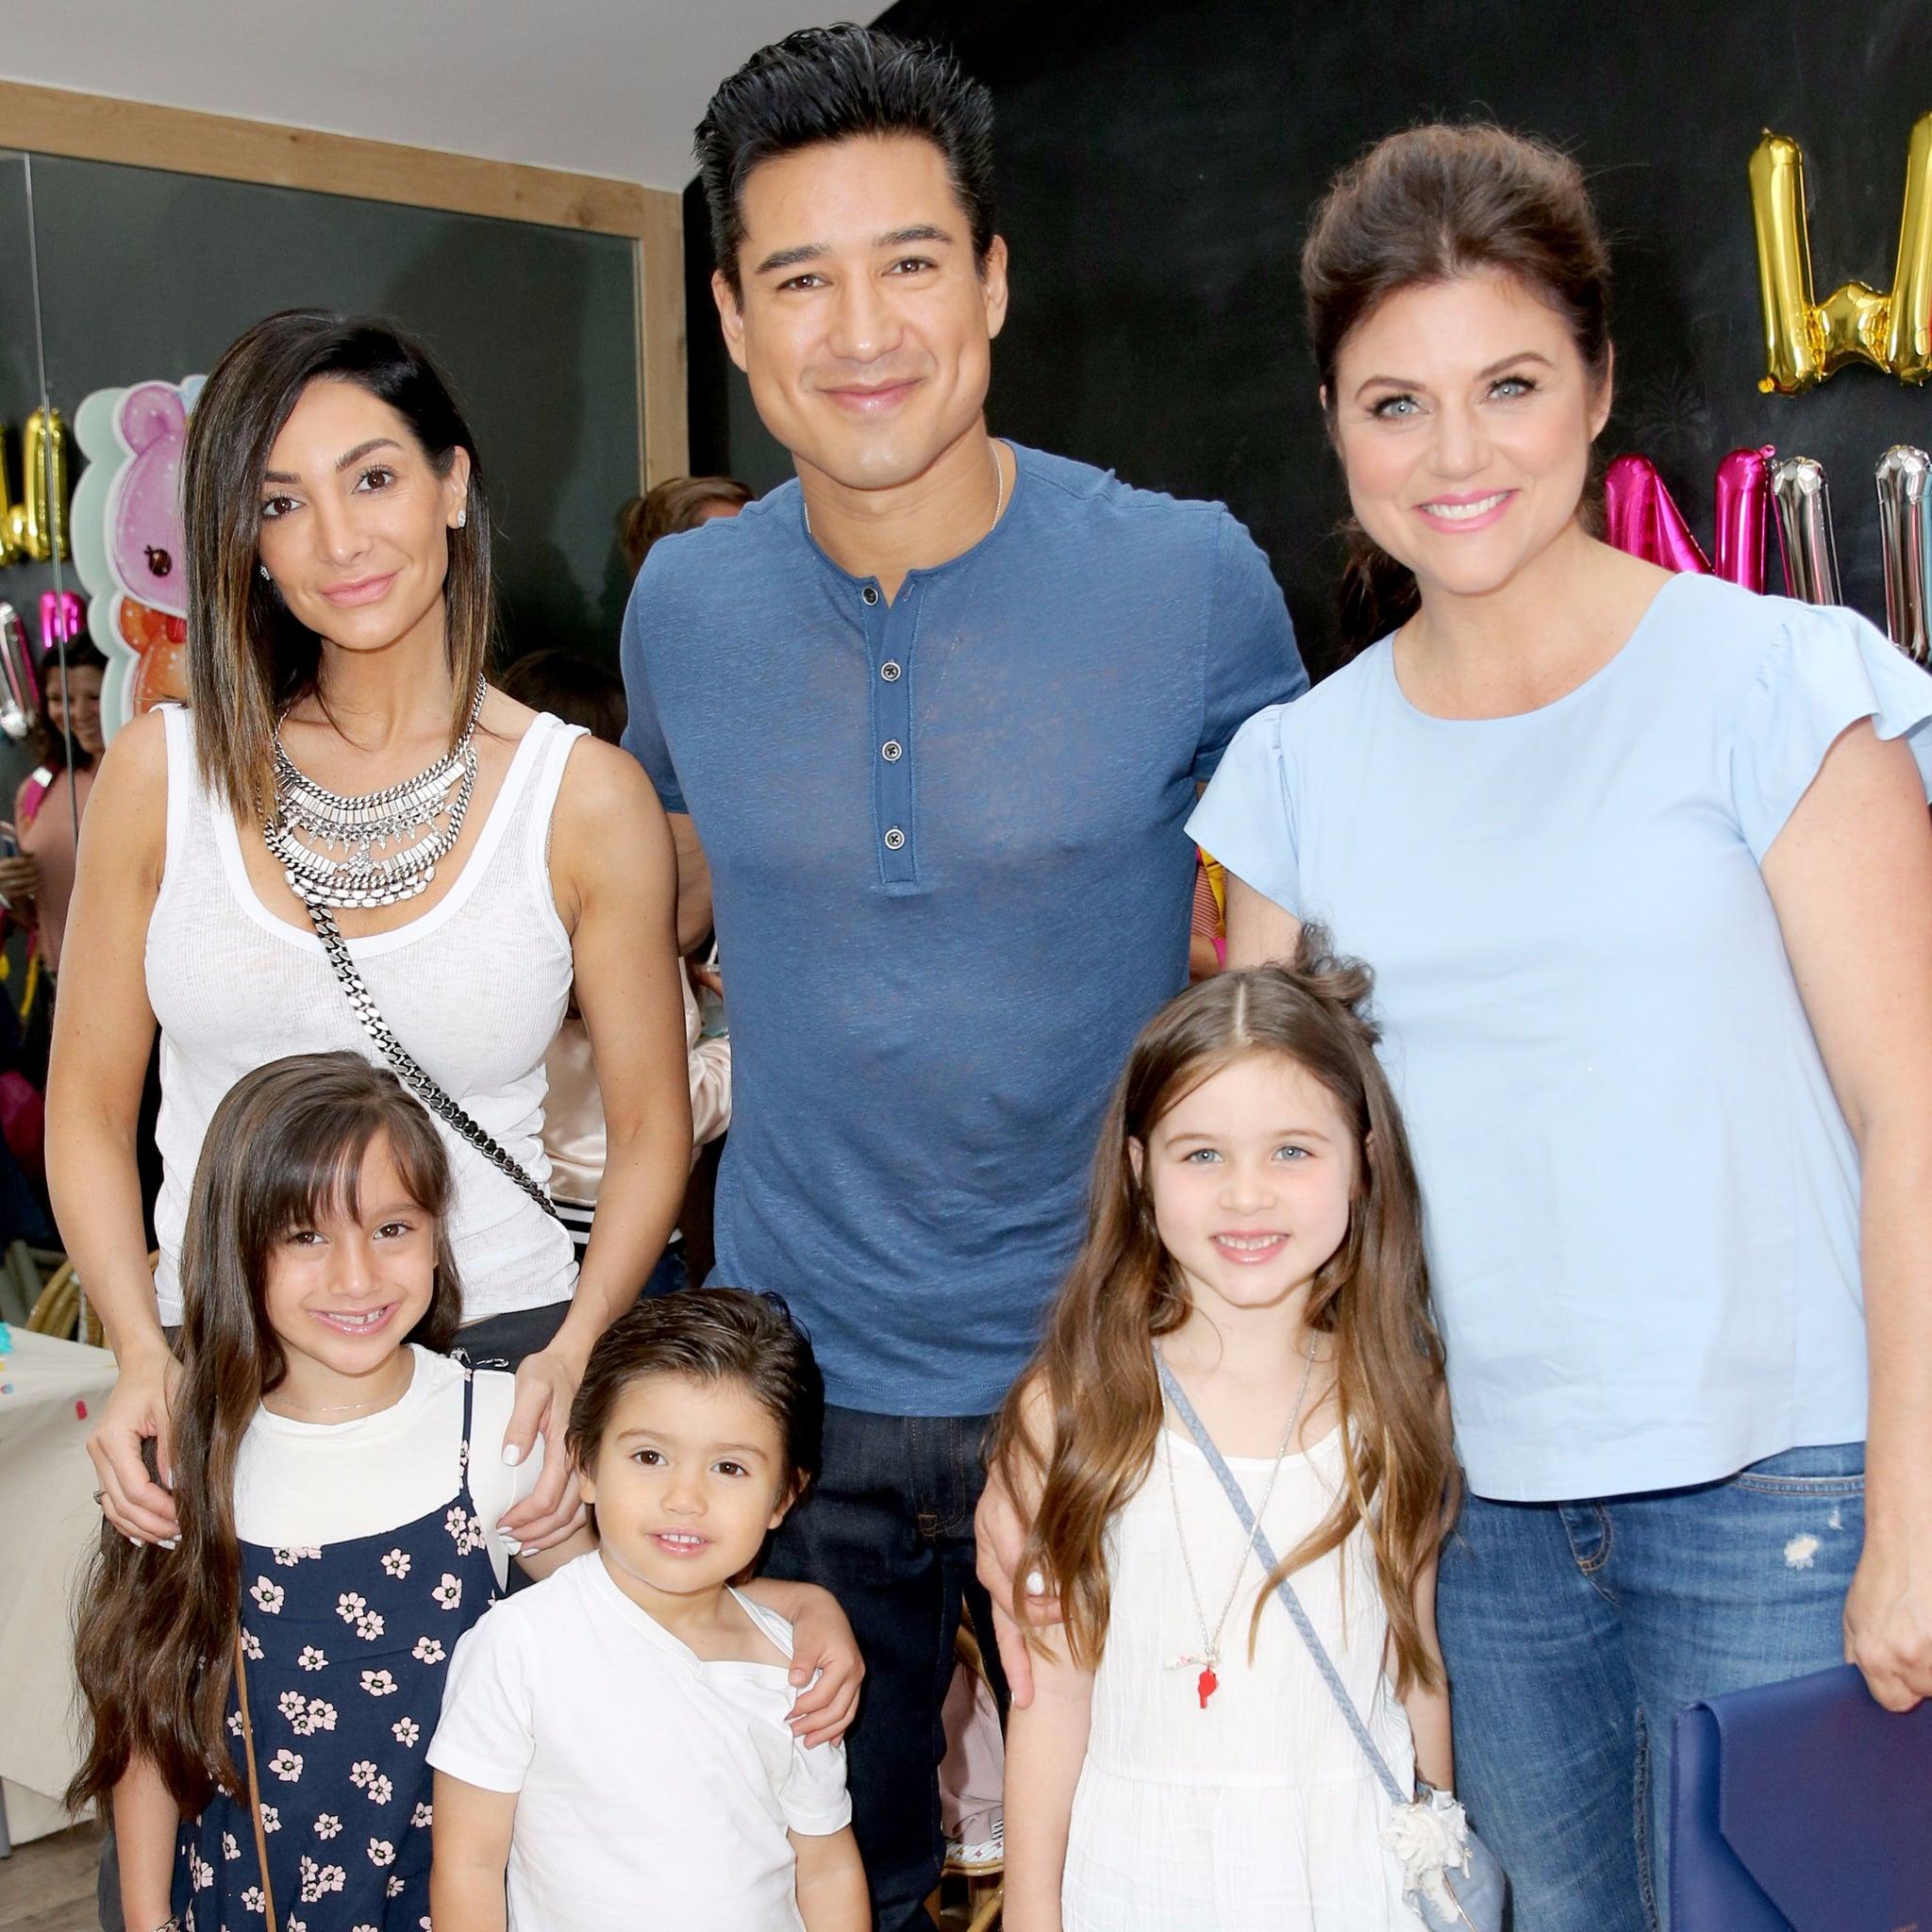 Tiffani Thiessen And Mario Lopez With Their Kids July 2017